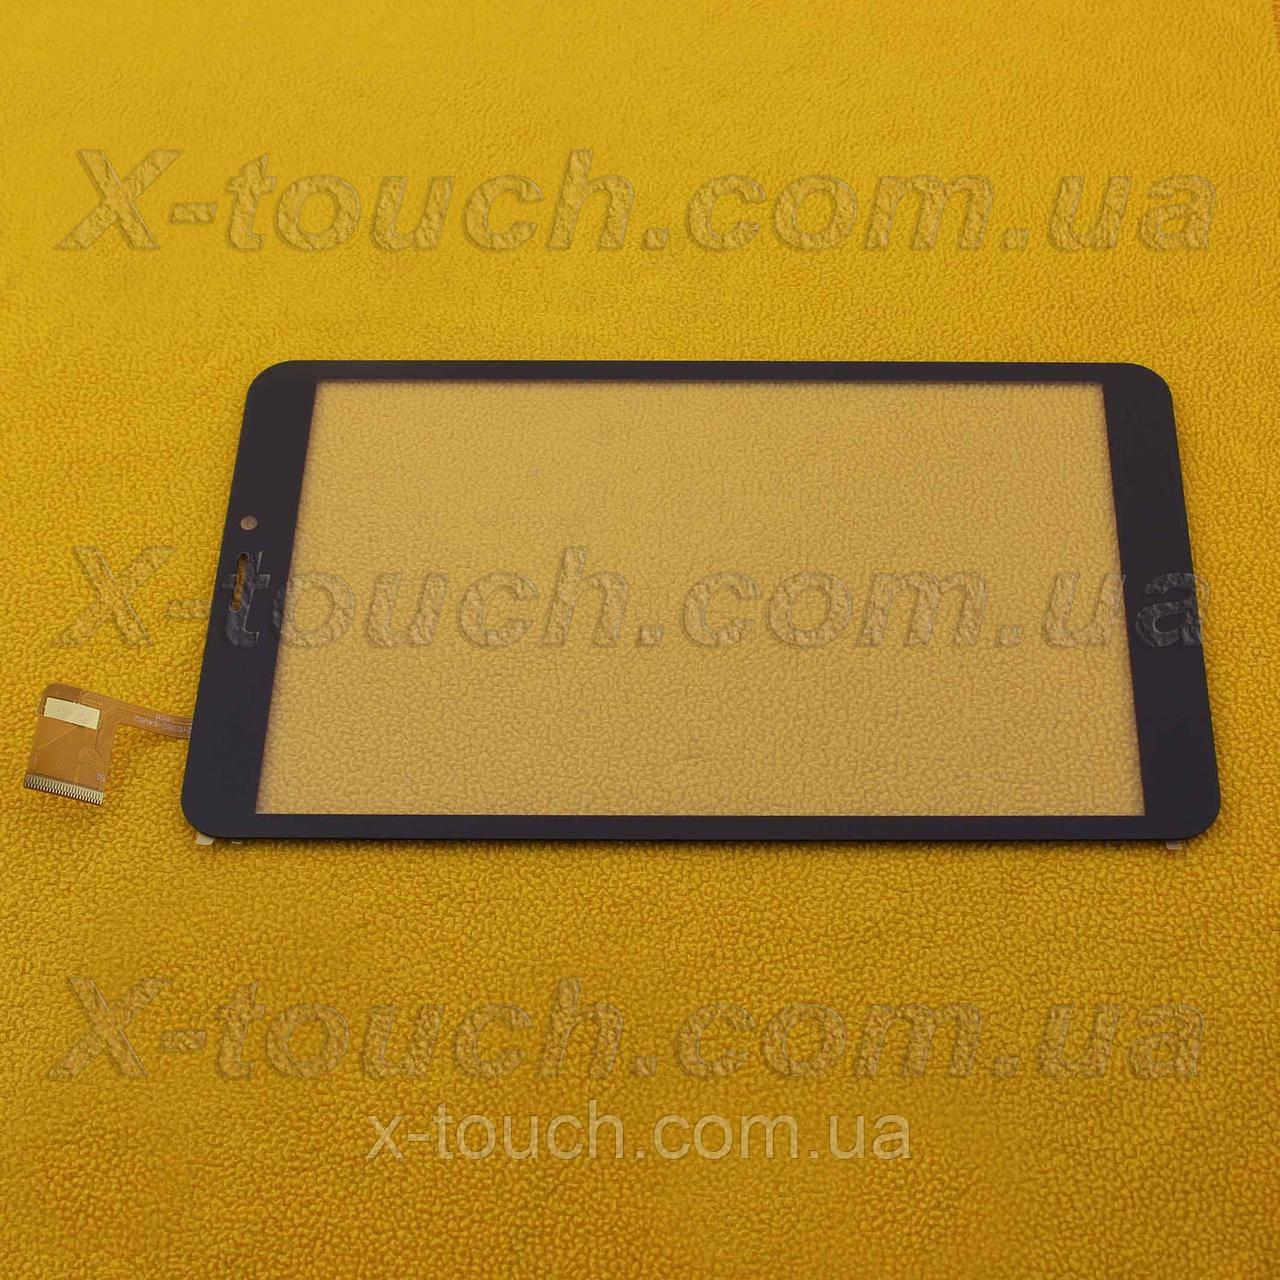 Тачскрин, сенсор Prestigio MultiPad Wize PMT3418 4G для планшета